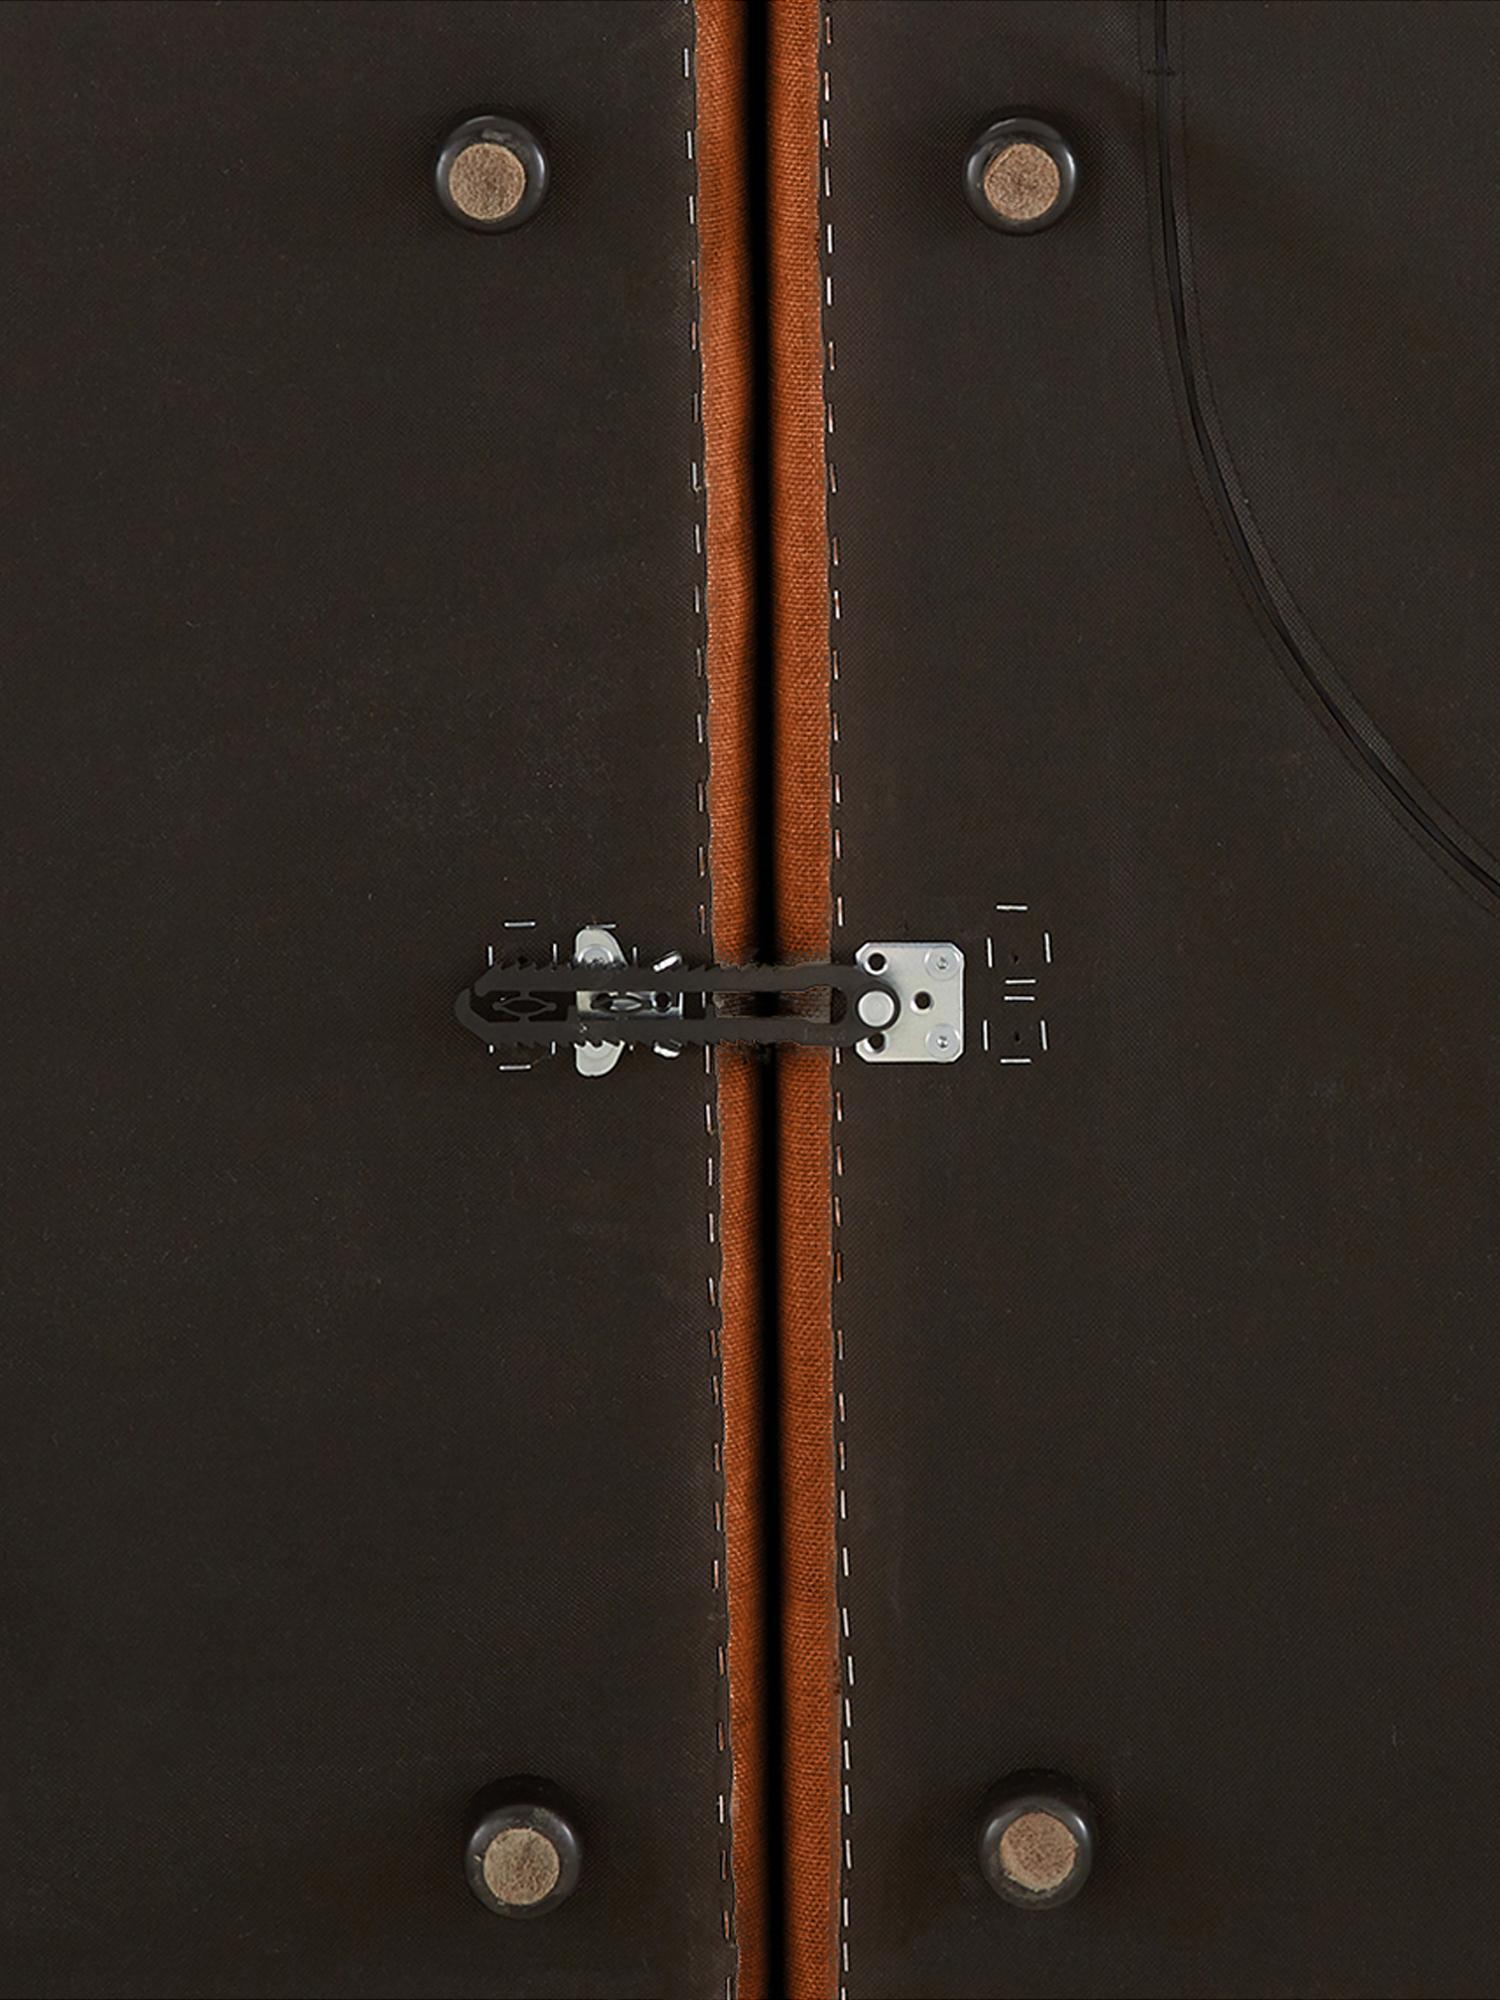 Modulare XL-Ottomane Lennon, Bezug: Polyester Der hochwertige, Gestell: Massives Kiefernholz, Spe, Füße: Kunststoff, Webstoff Terrakotta, B 357 x T 119 cm